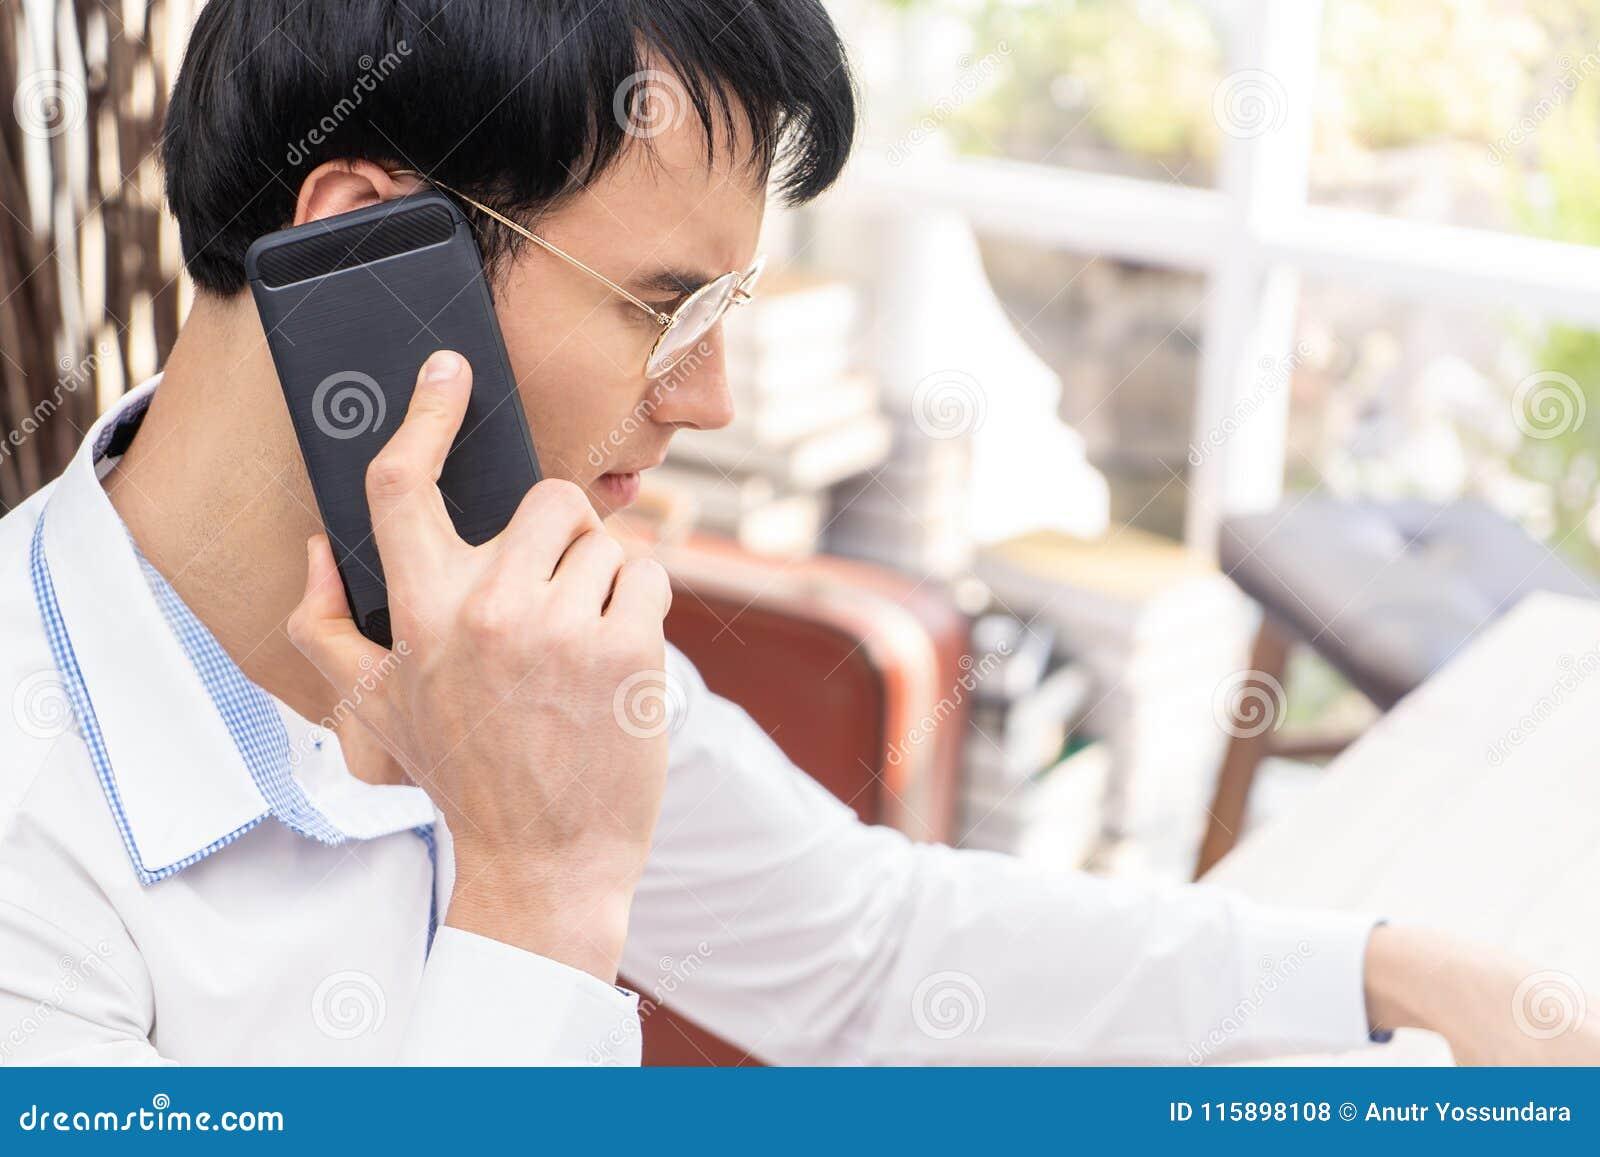 Man with glasses using black mobile phone closed up shot, bri